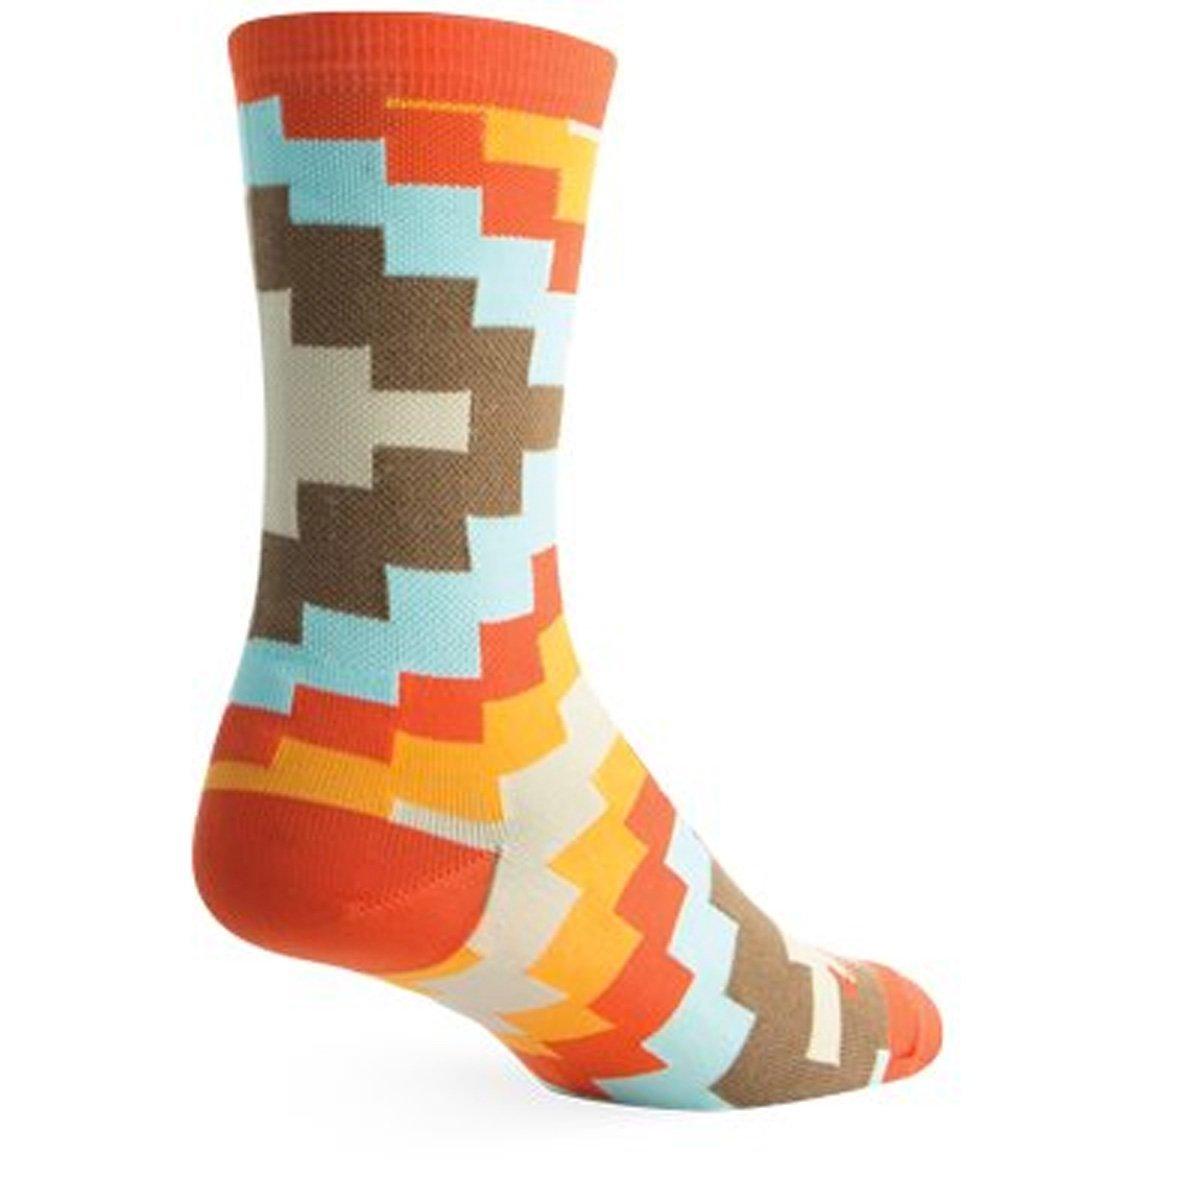 "Socks - SockGuy - Crew 6"" Aztec S/M Cycling/Running"